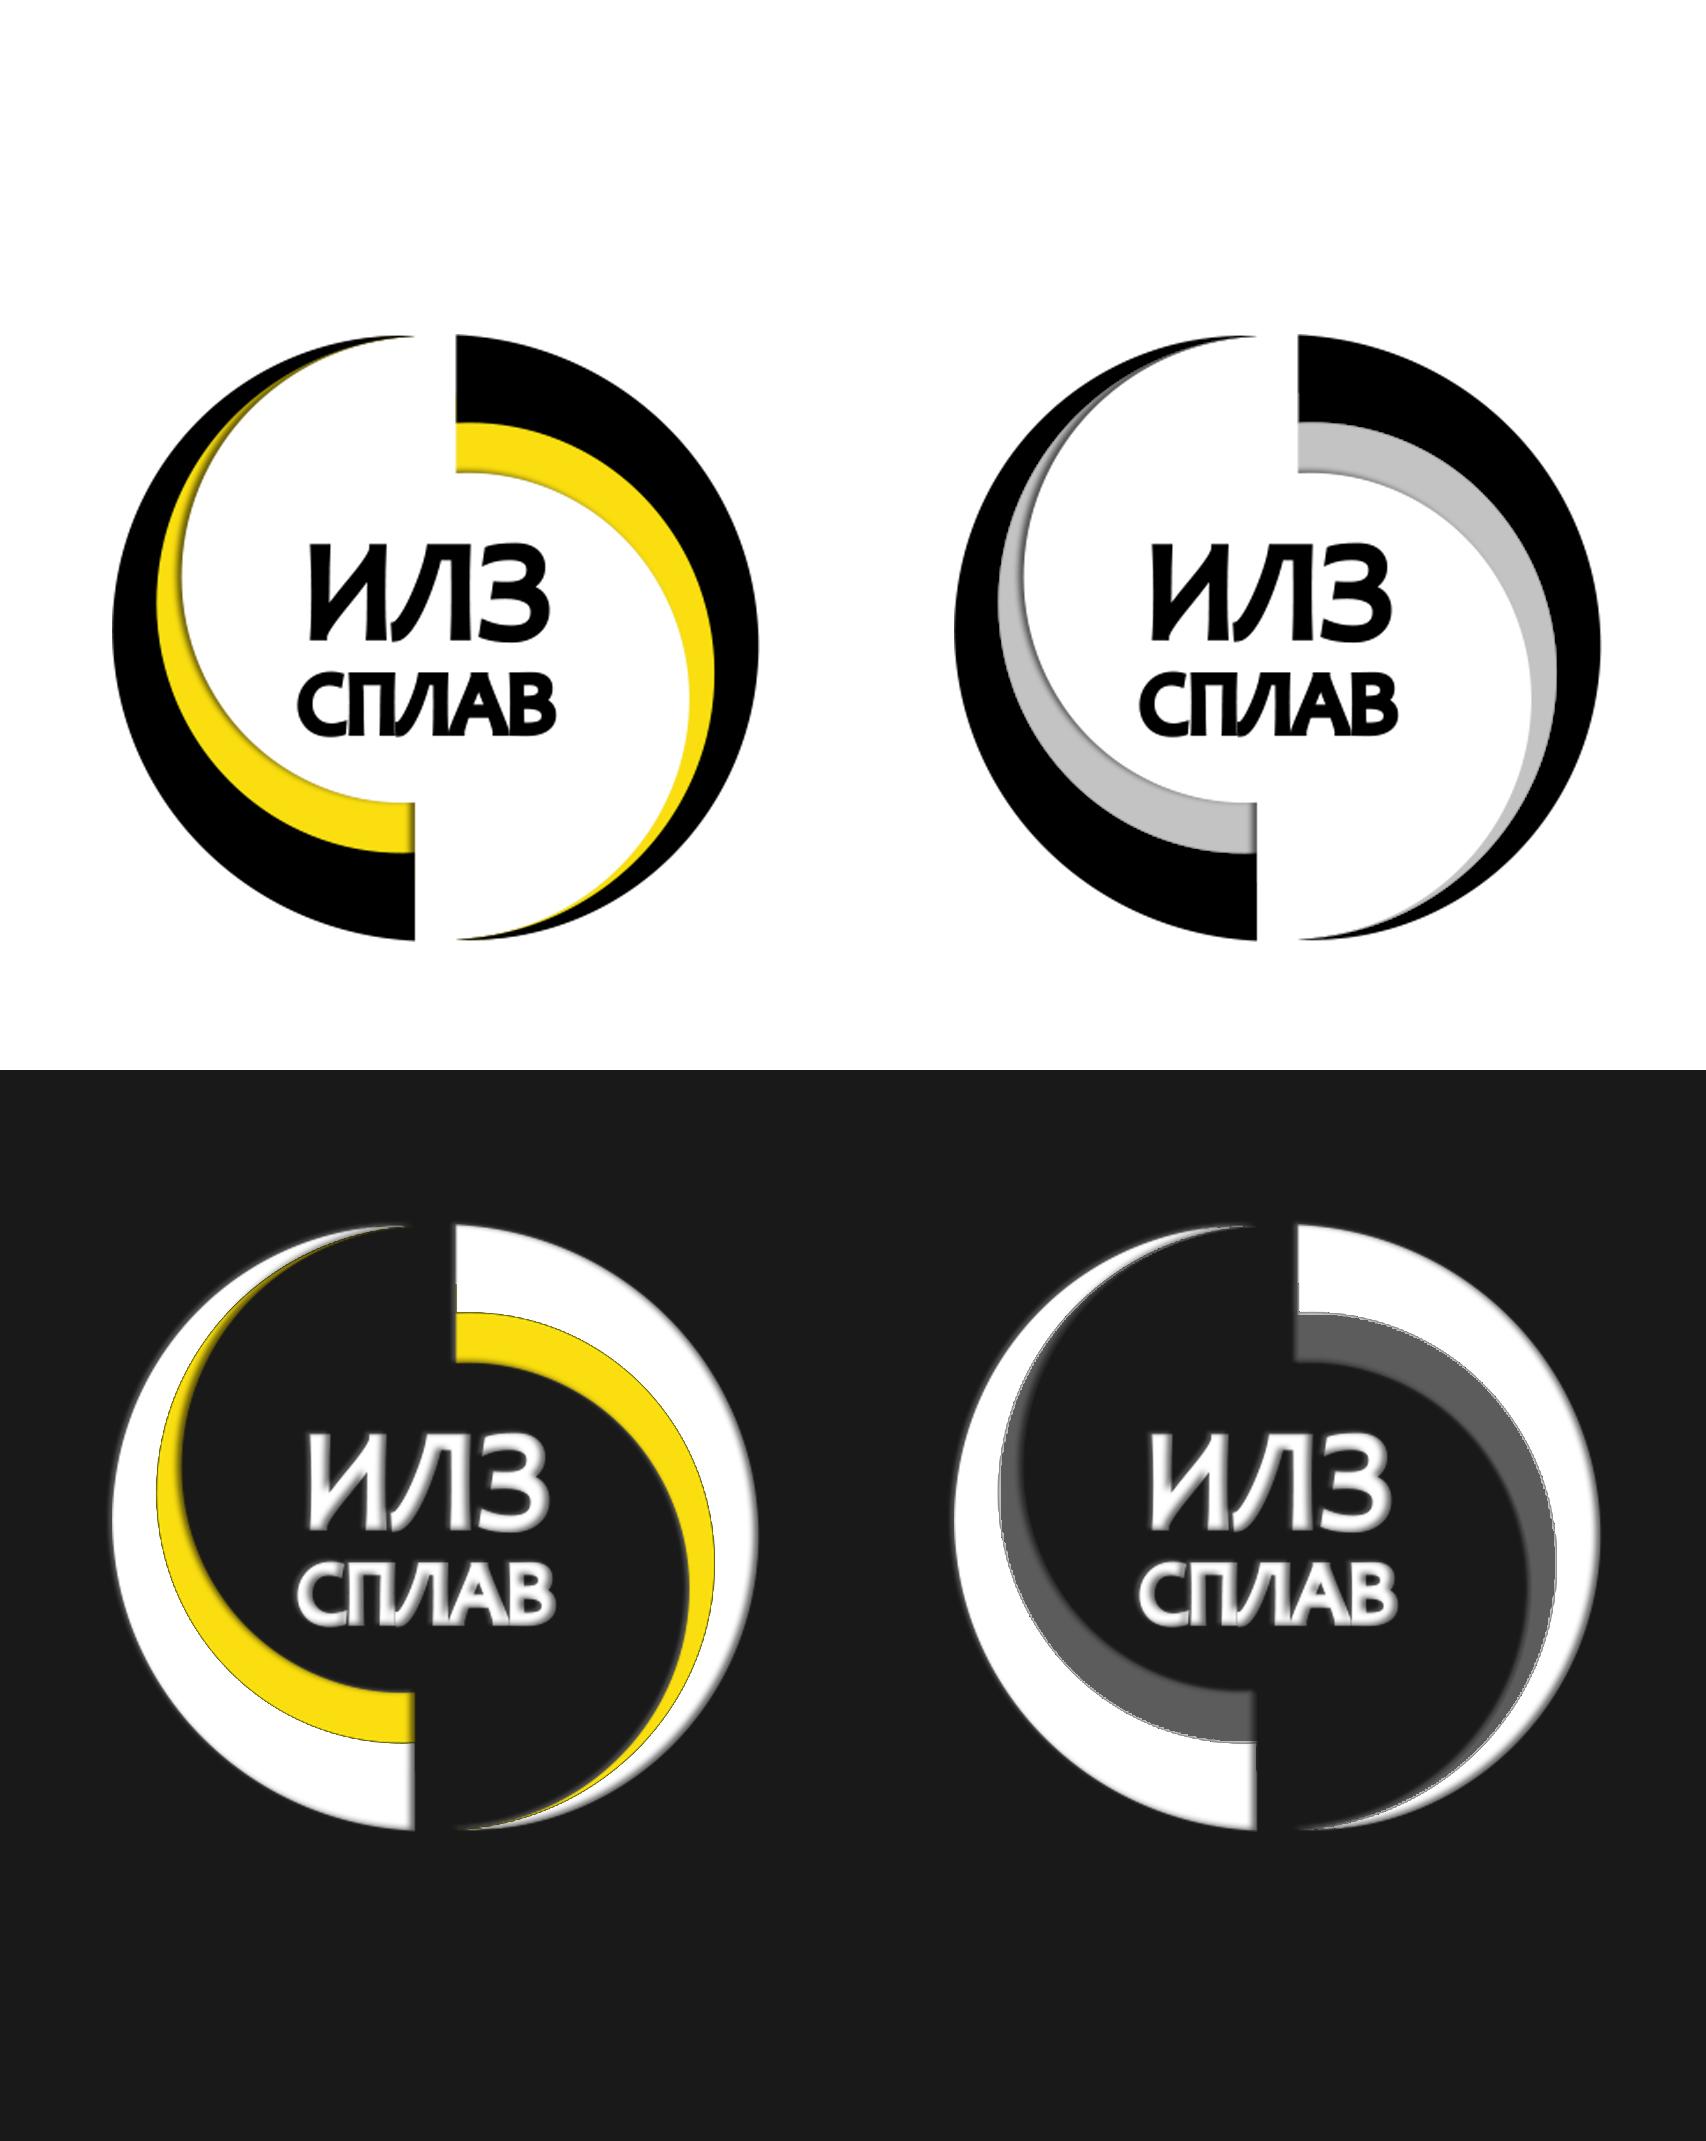 Разработать логотип для литейного завода фото f_9225b1458a3a133d.jpg